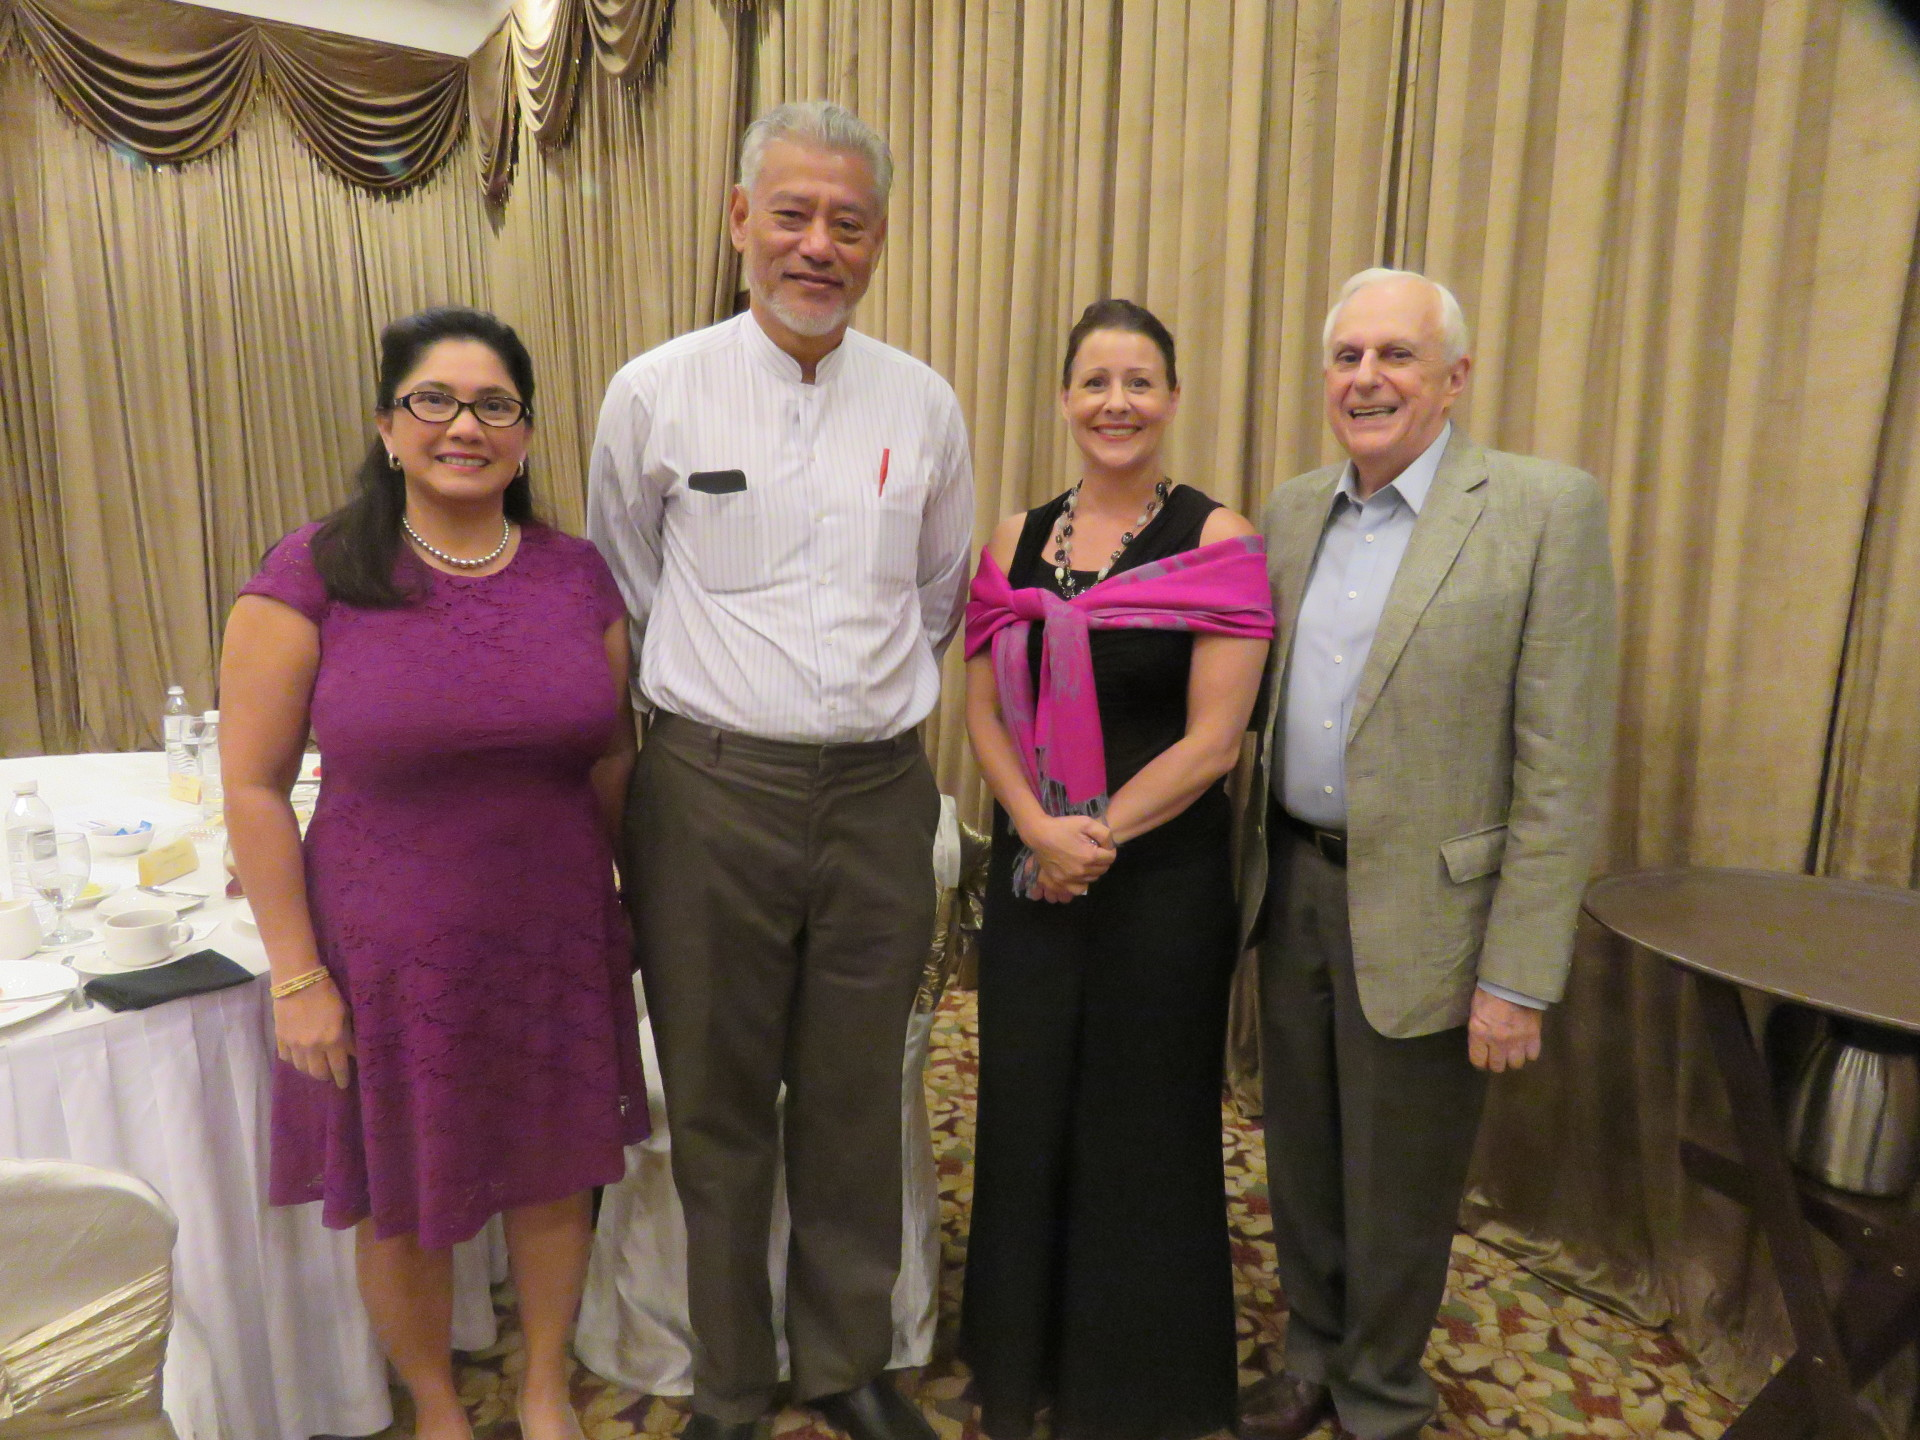 Mrs Siobhan Das, Dr Jomo Sundaram, Ms Valerie Lynn and Datuk Nicholas Zefferys